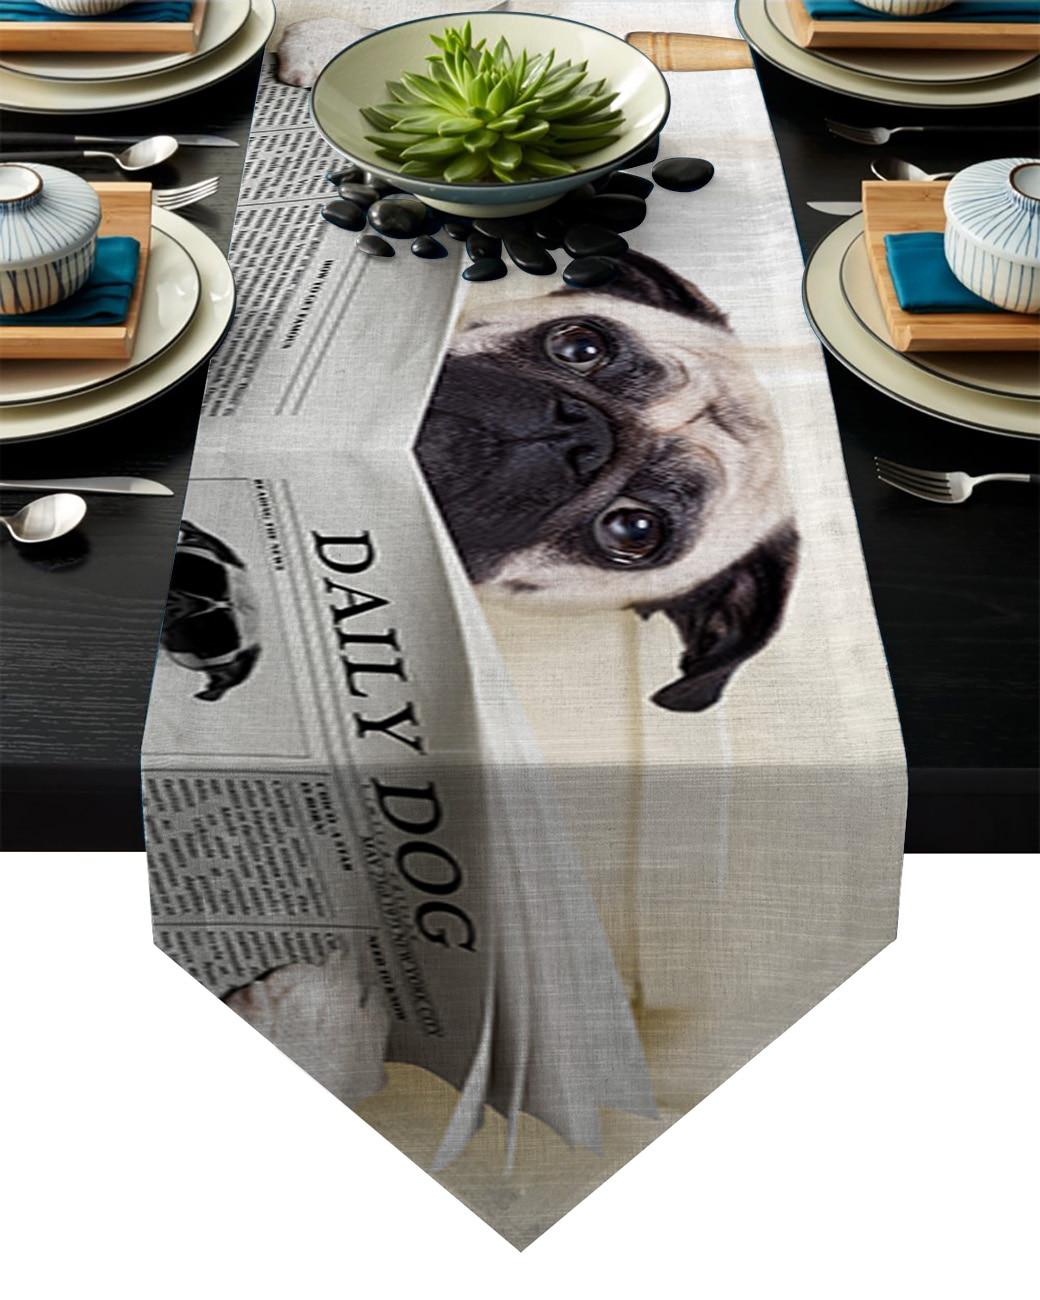 Divertido periódico perro camino de mesa bandera decoración de fiesta casera mantel corredores de mesa para boda